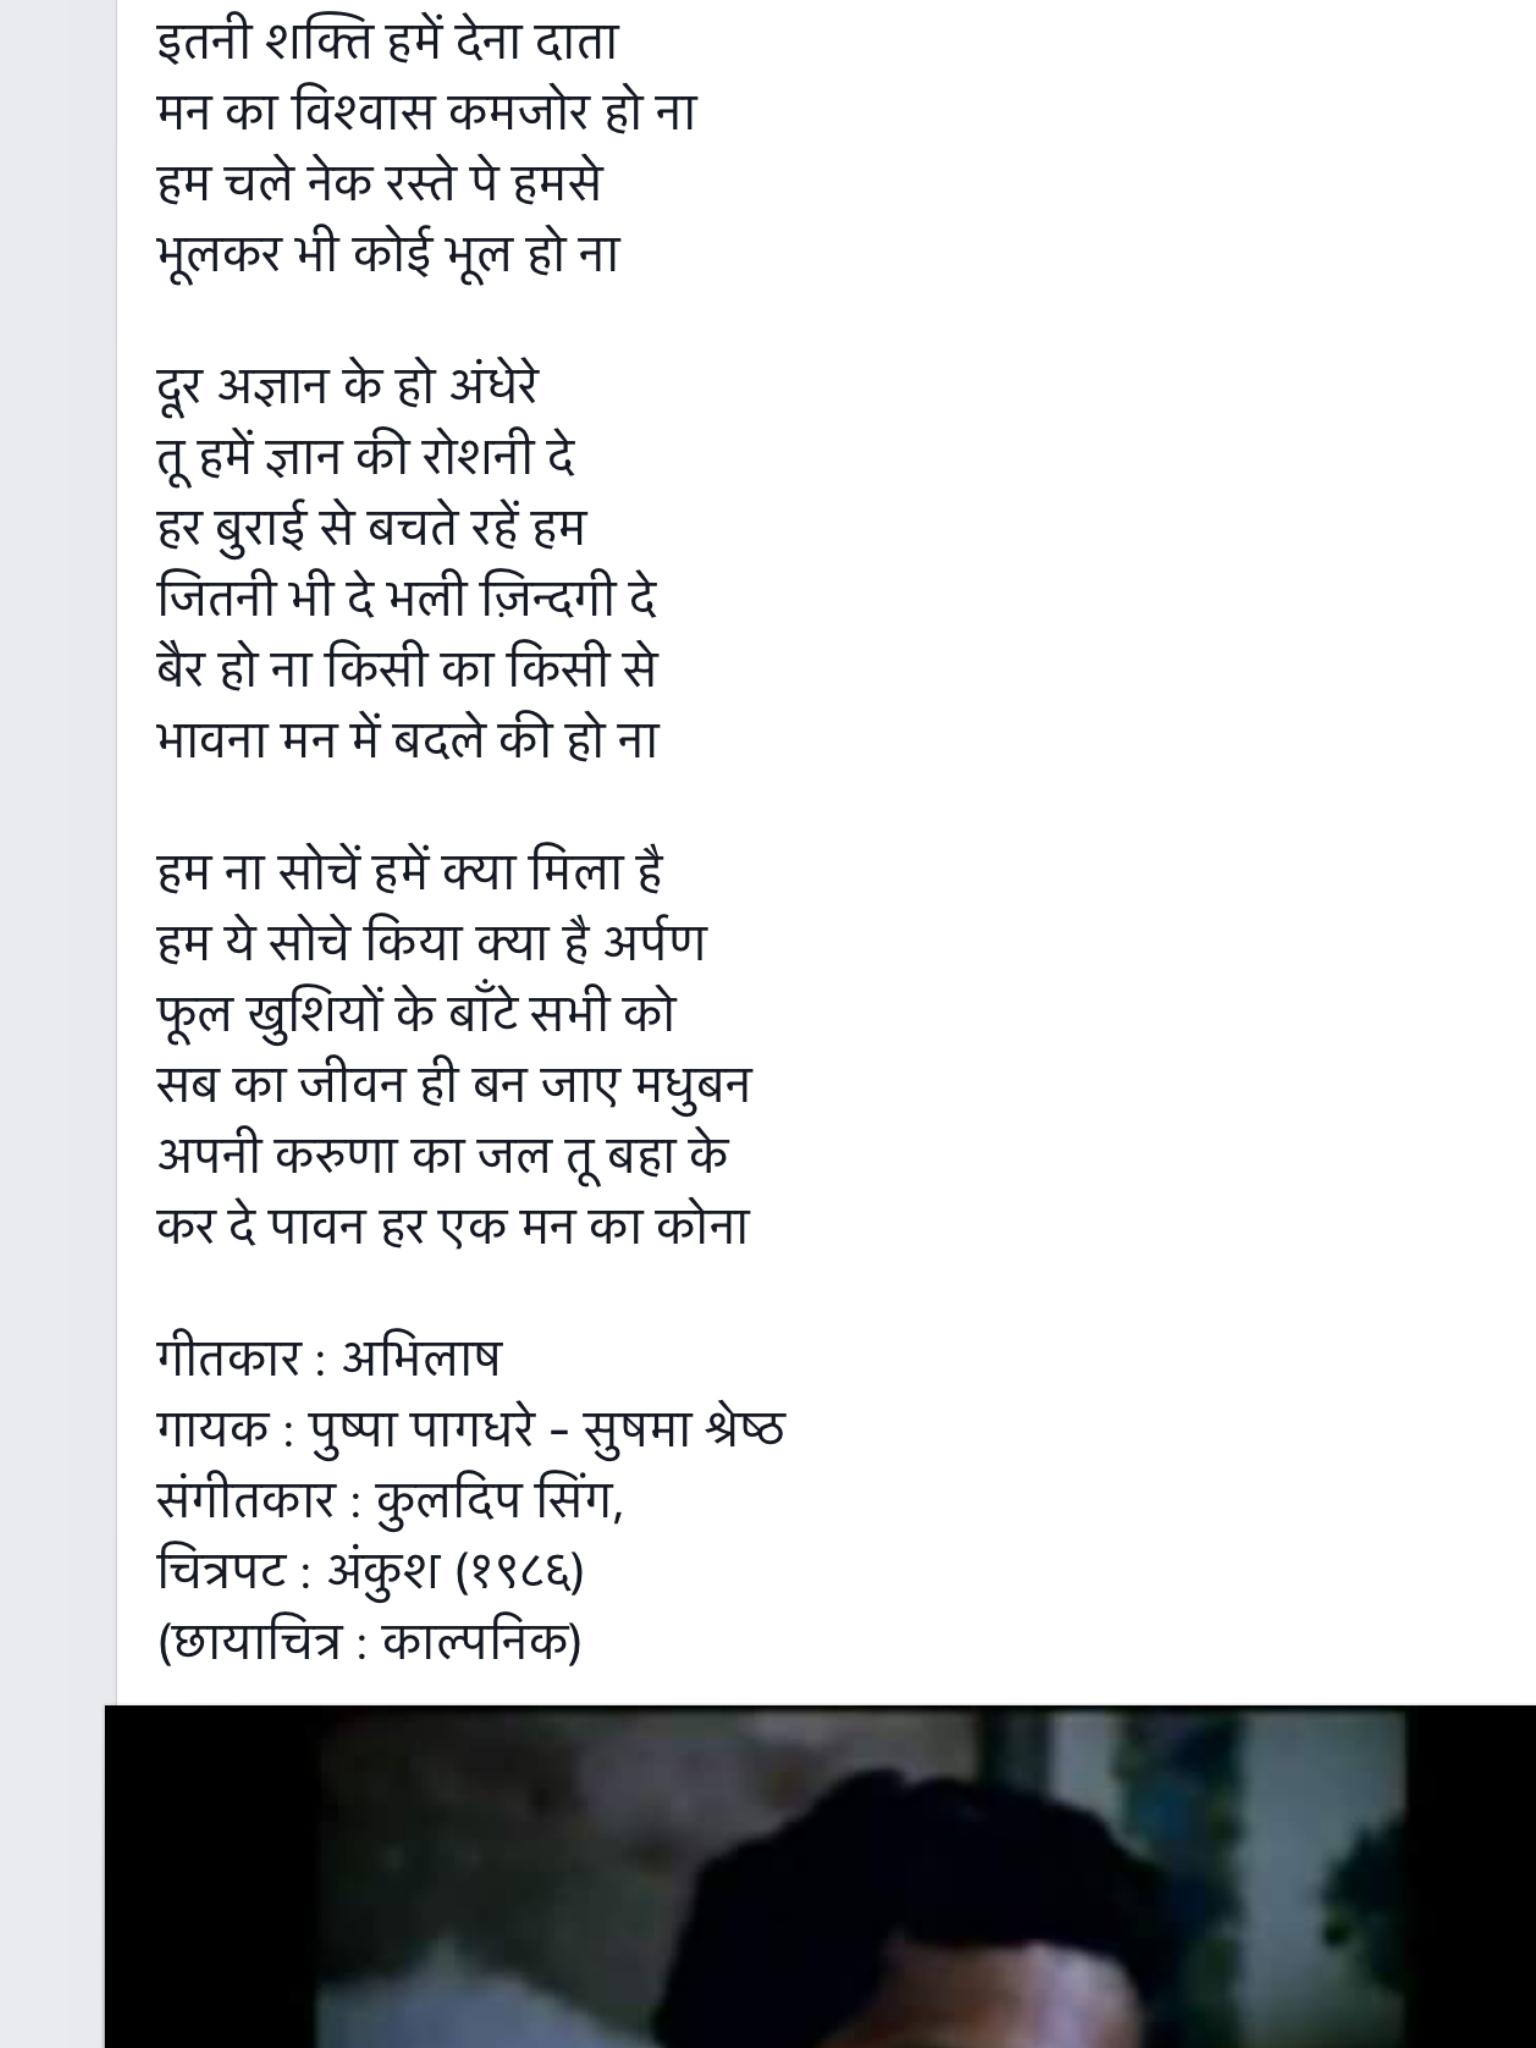 Pin By Effat Bajwa On Hindi Songs And Lyrics Song Lyric Quotes Old Bollywood Songs Cool Lyrics